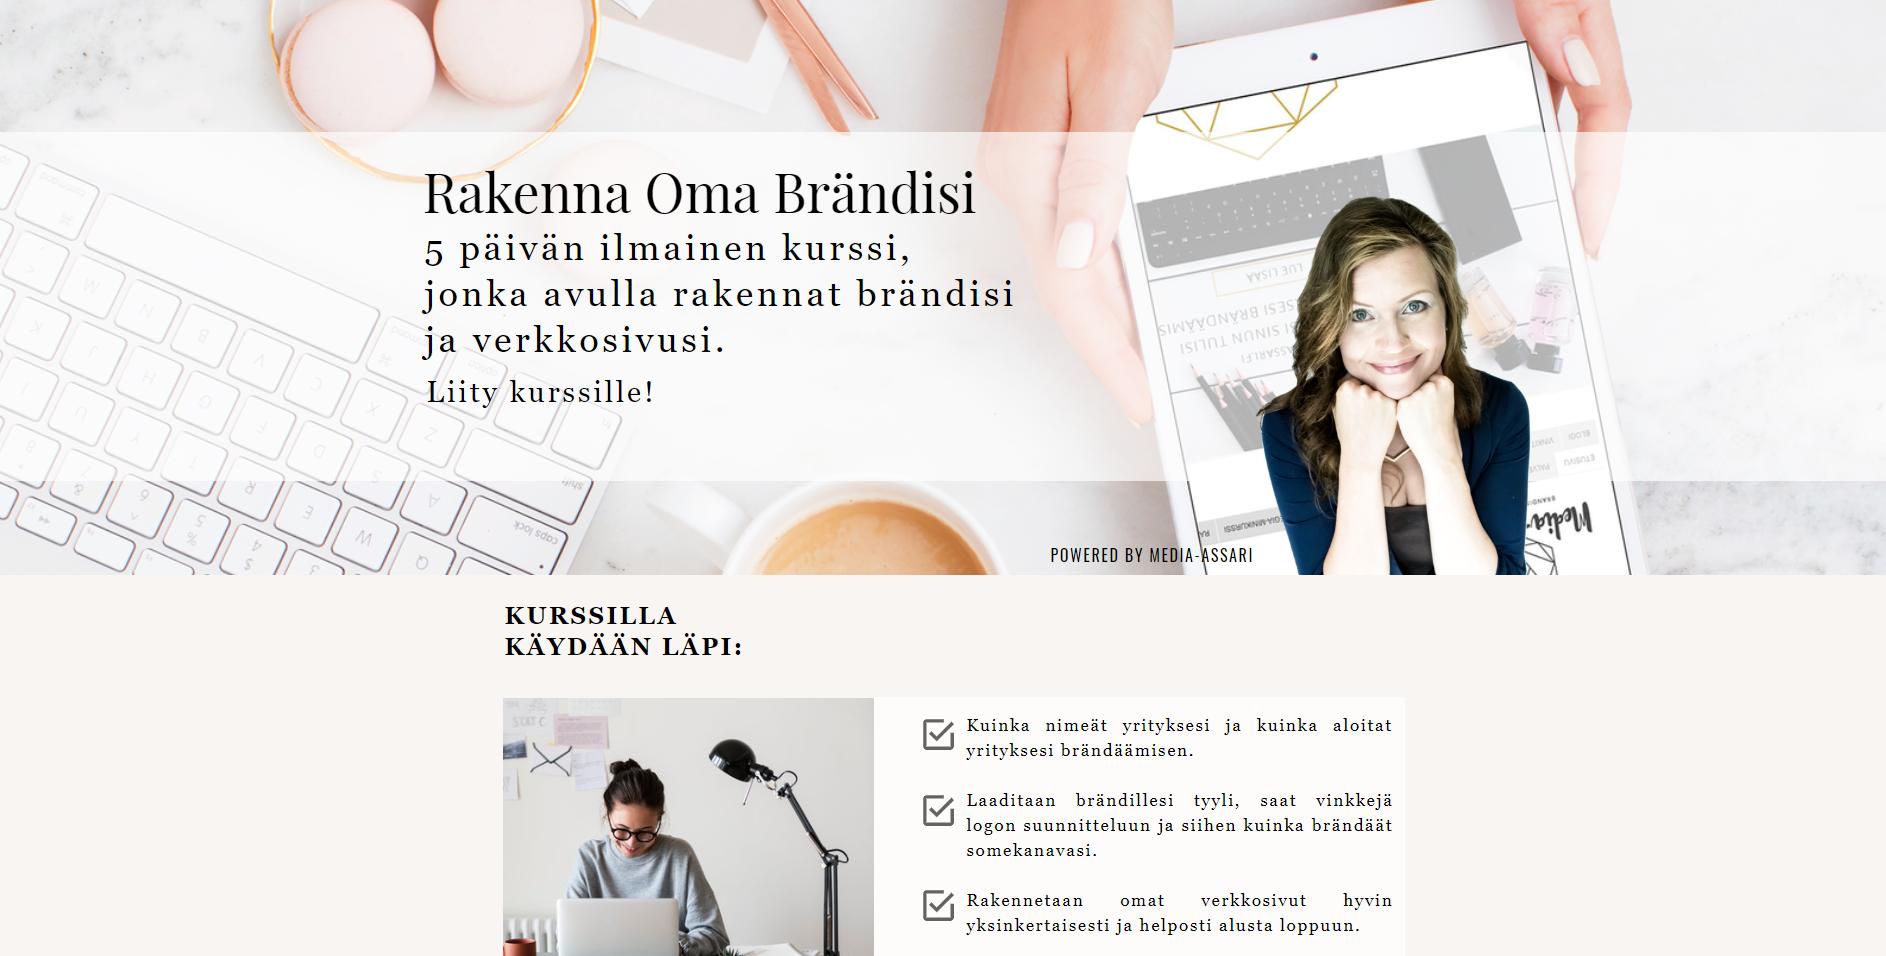 rakenna_oma_brandisi